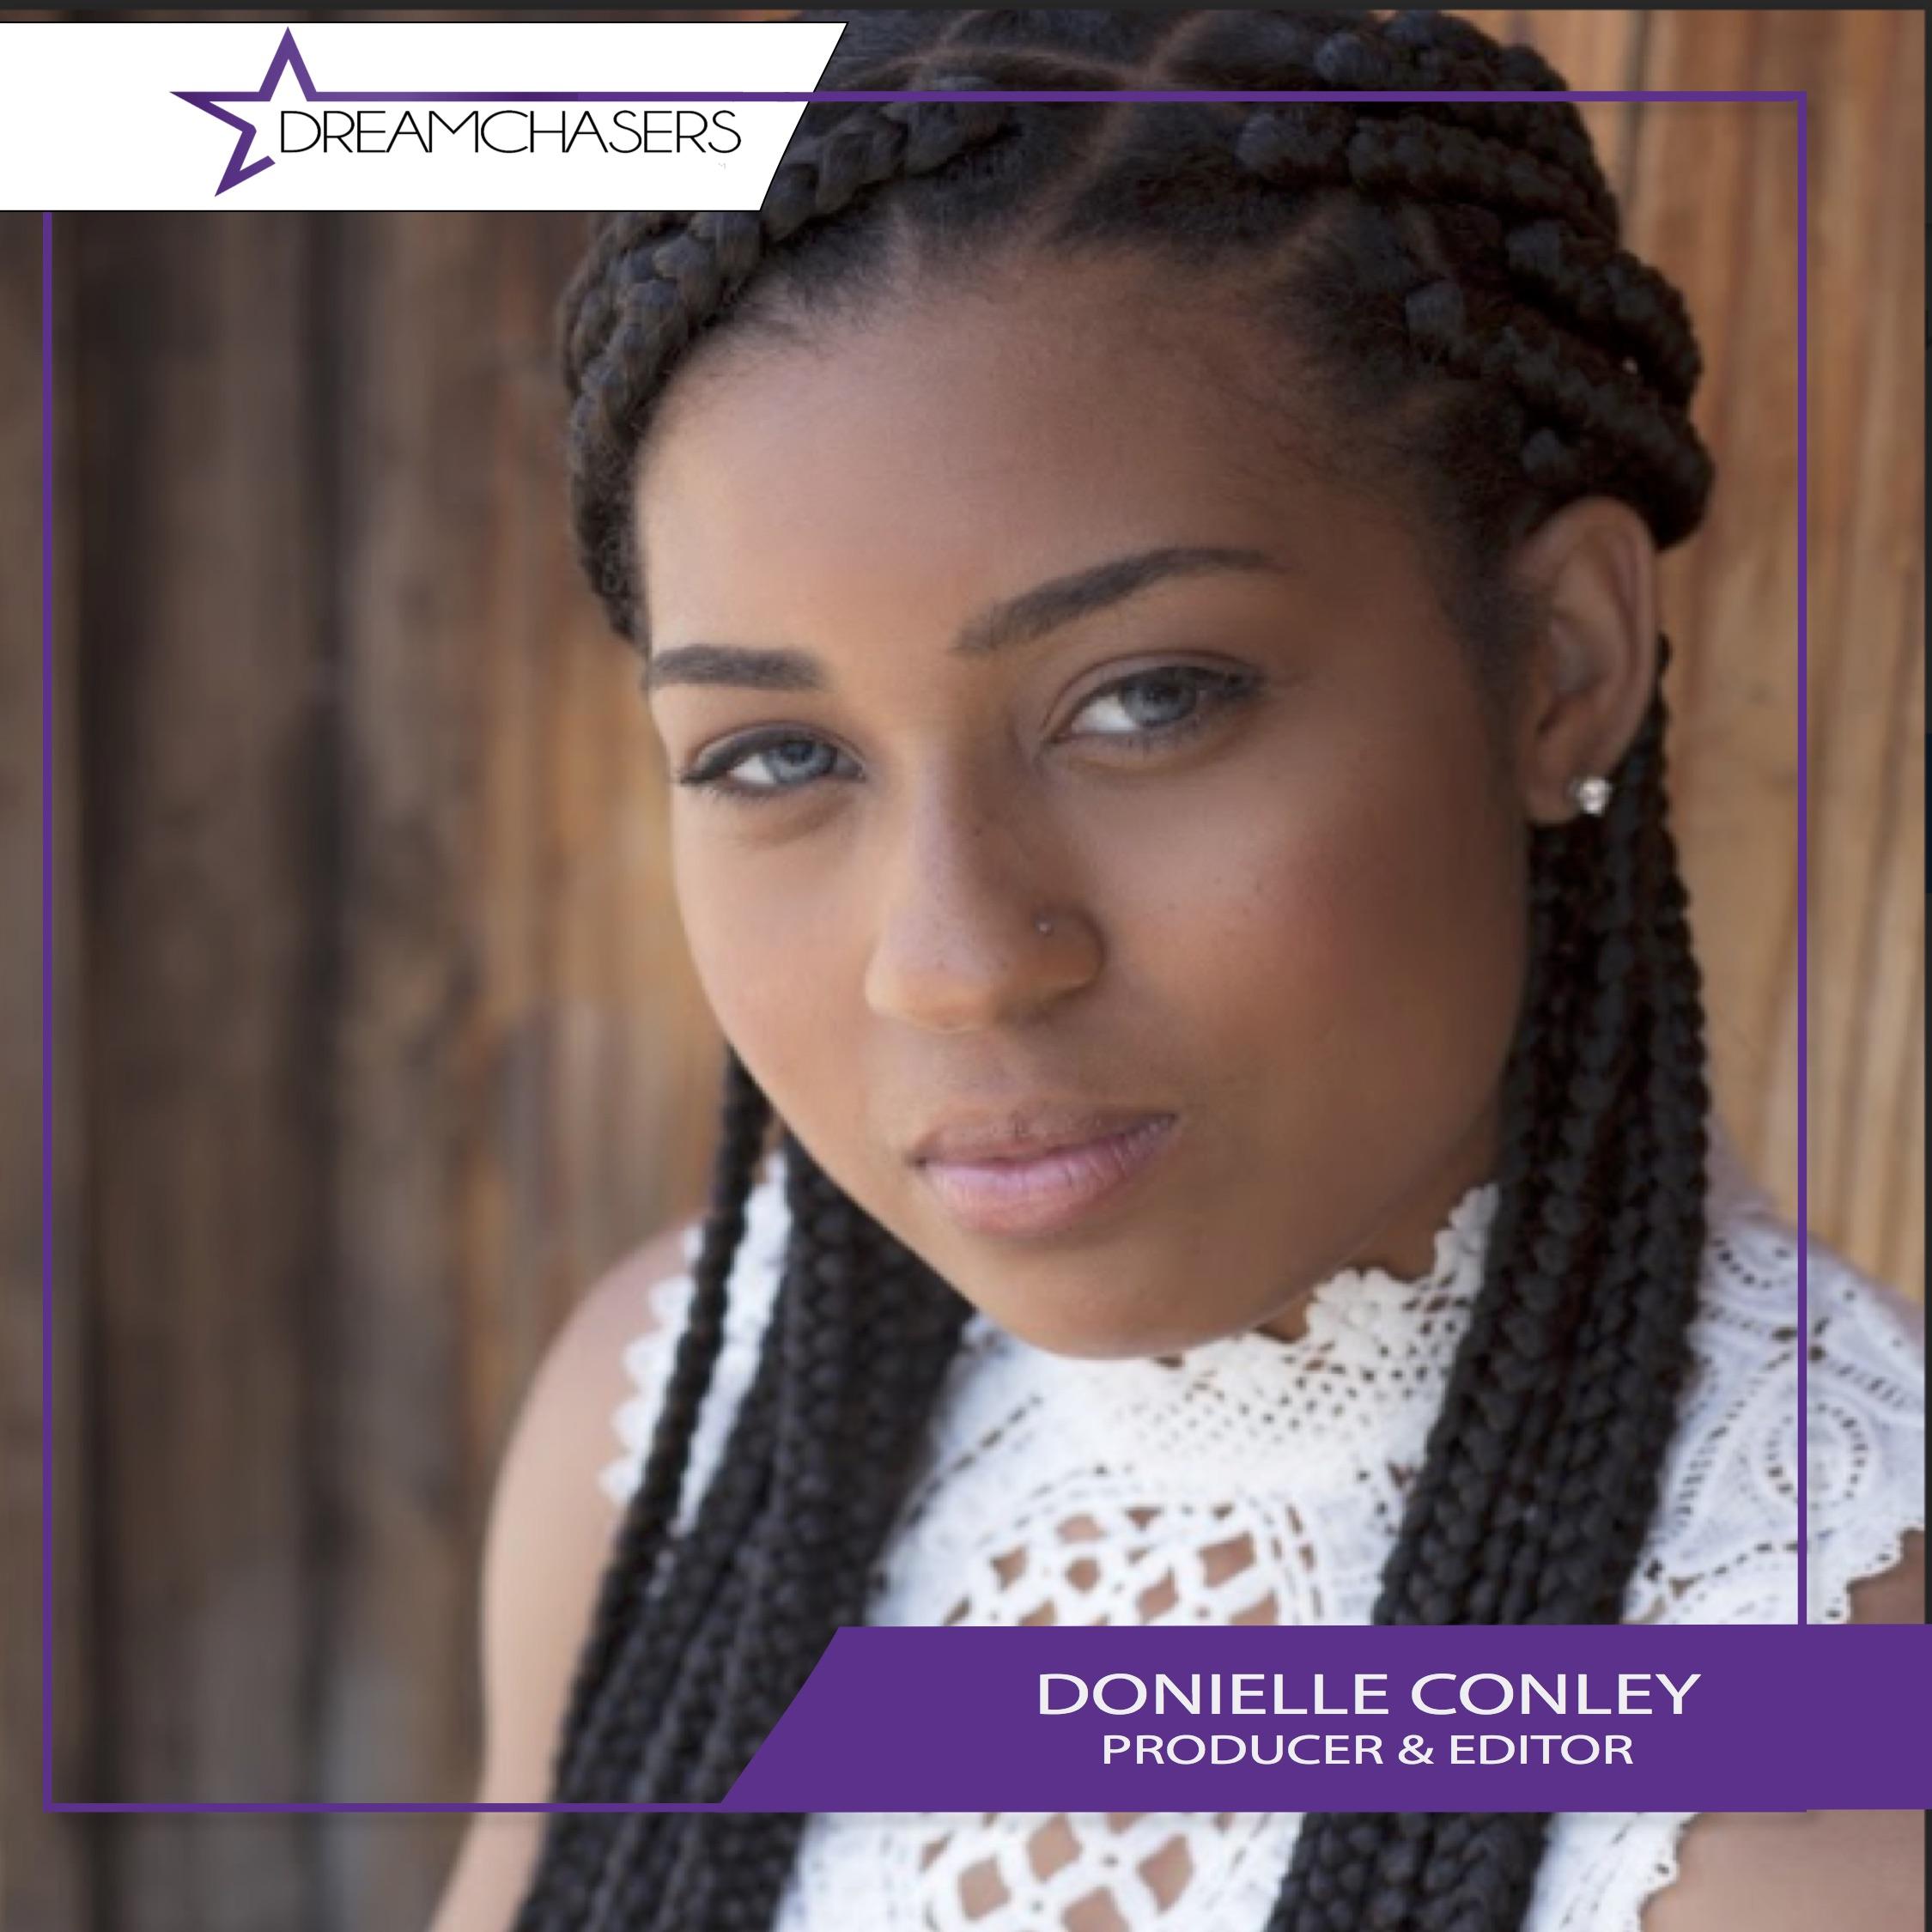 Donielle Conley